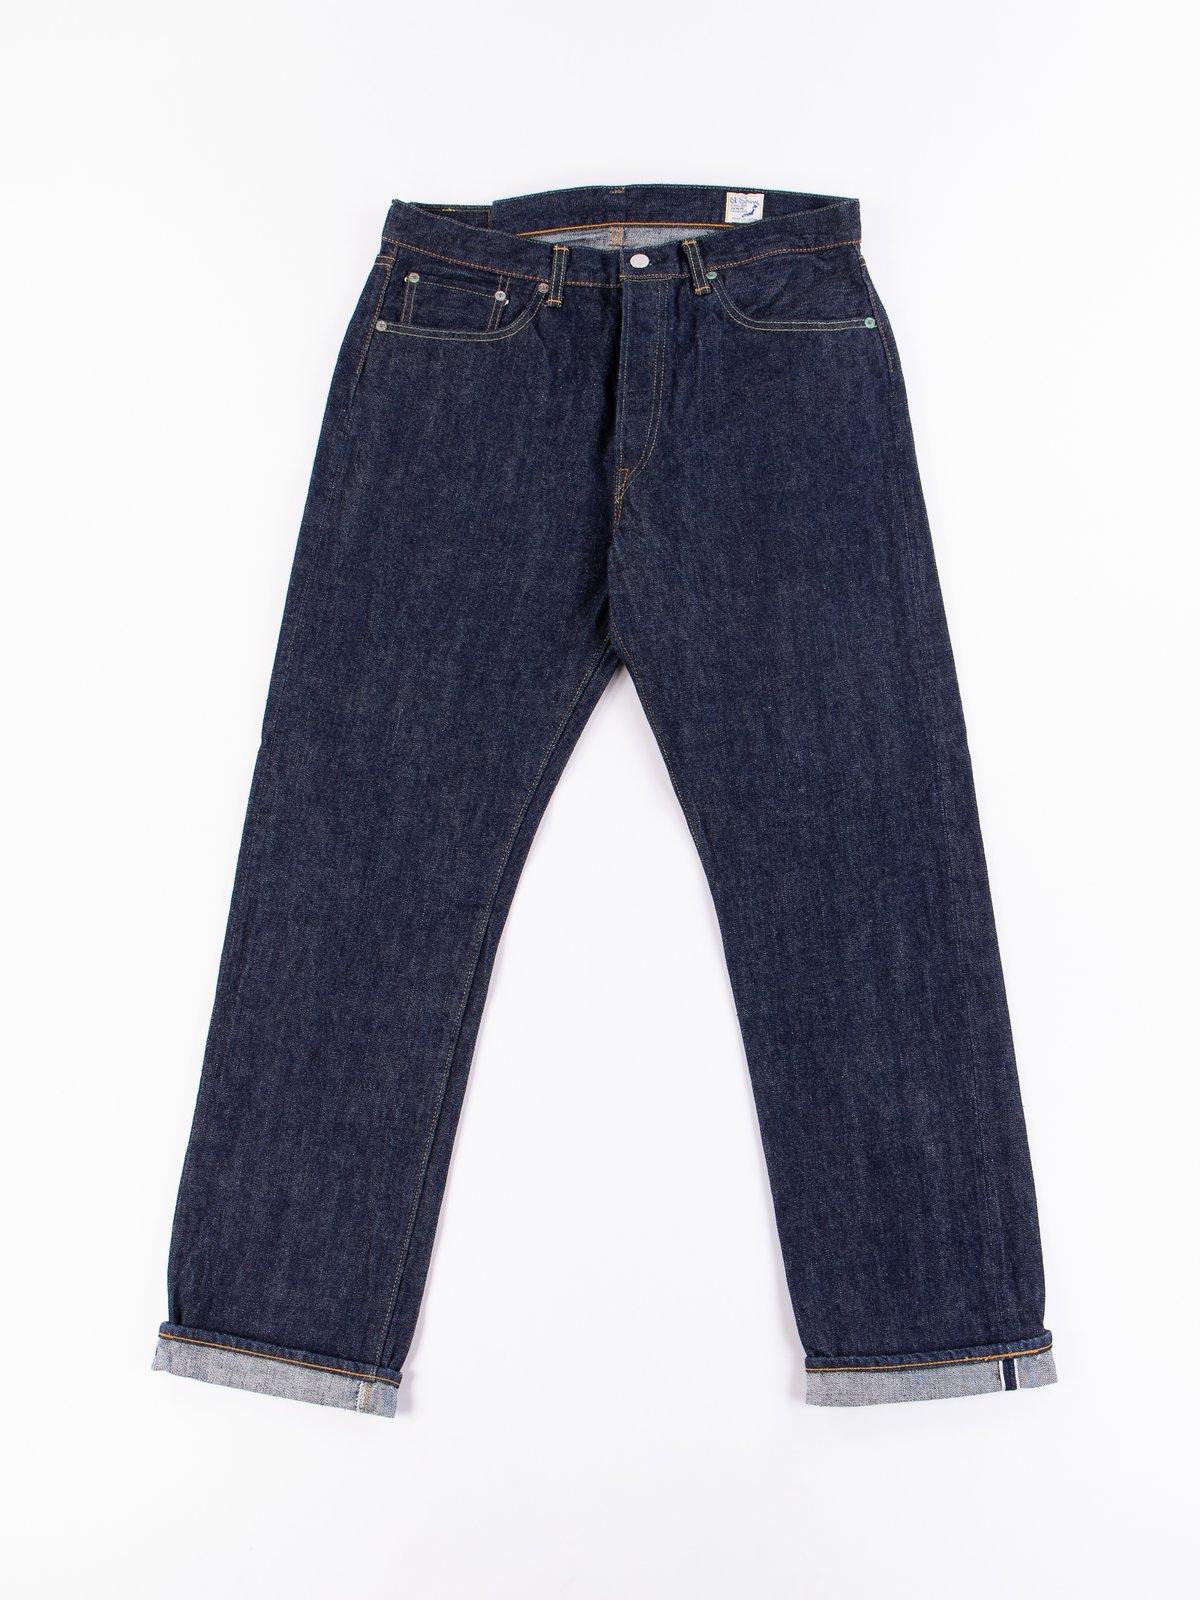 Indigo One Wash 105 Standard 5 Pocket Jean - Image 1